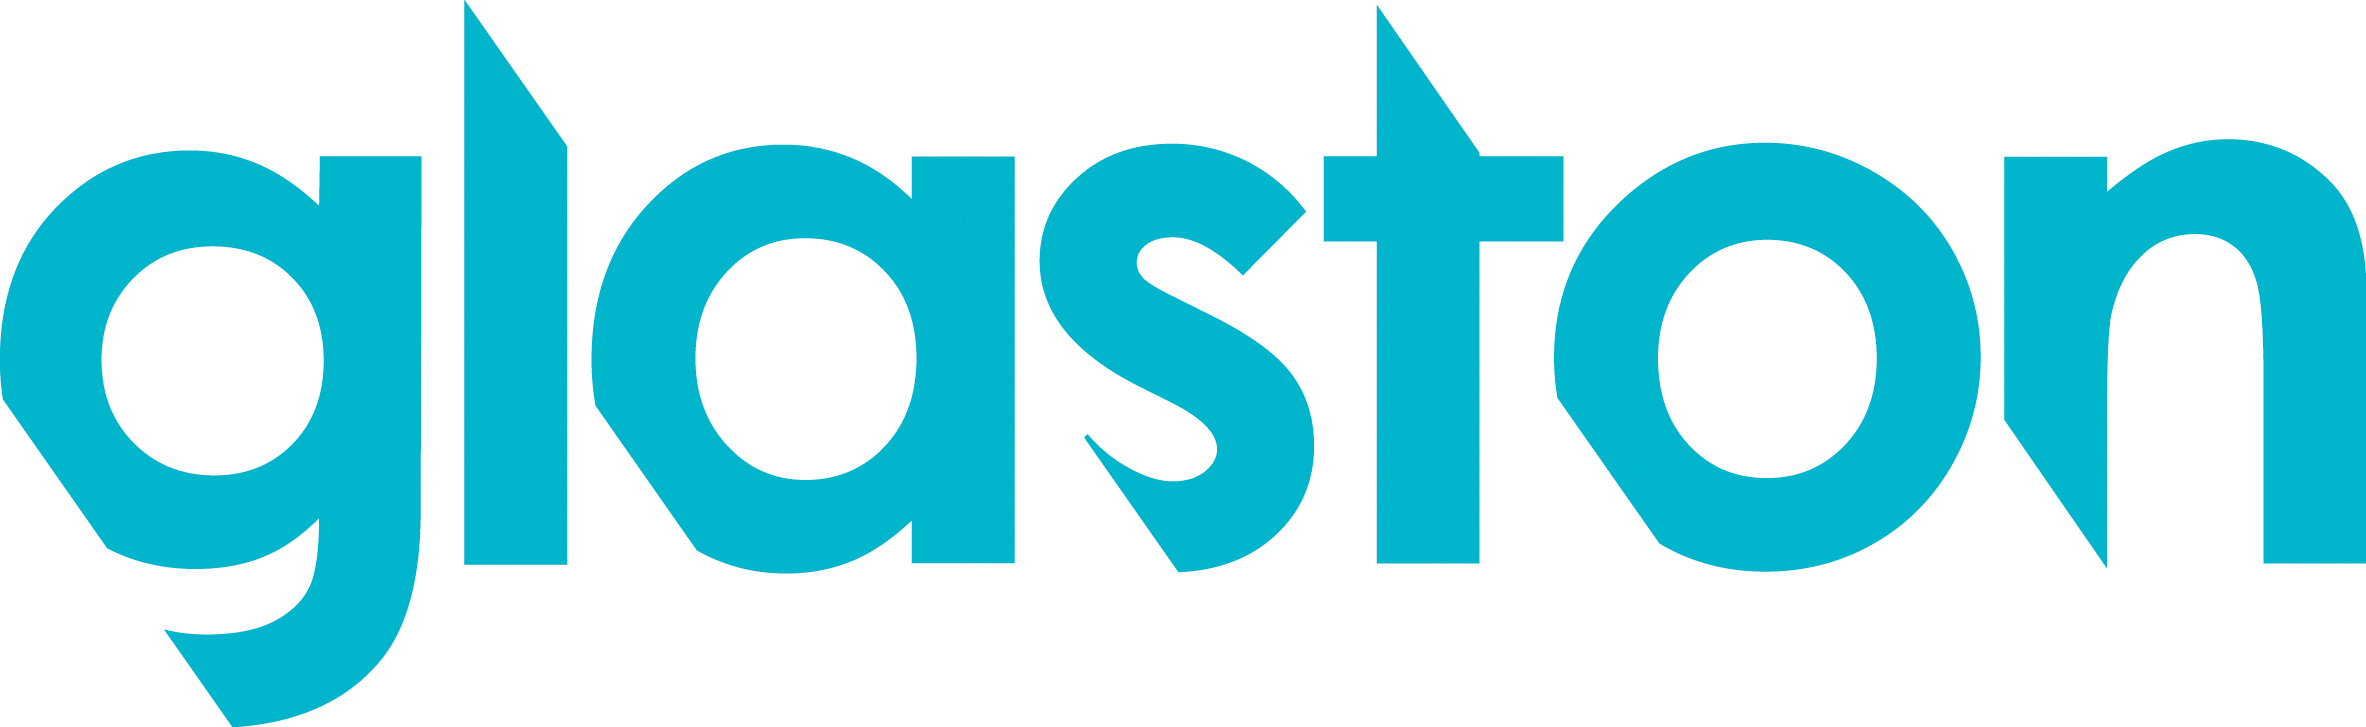 logo: Glaston Oyj